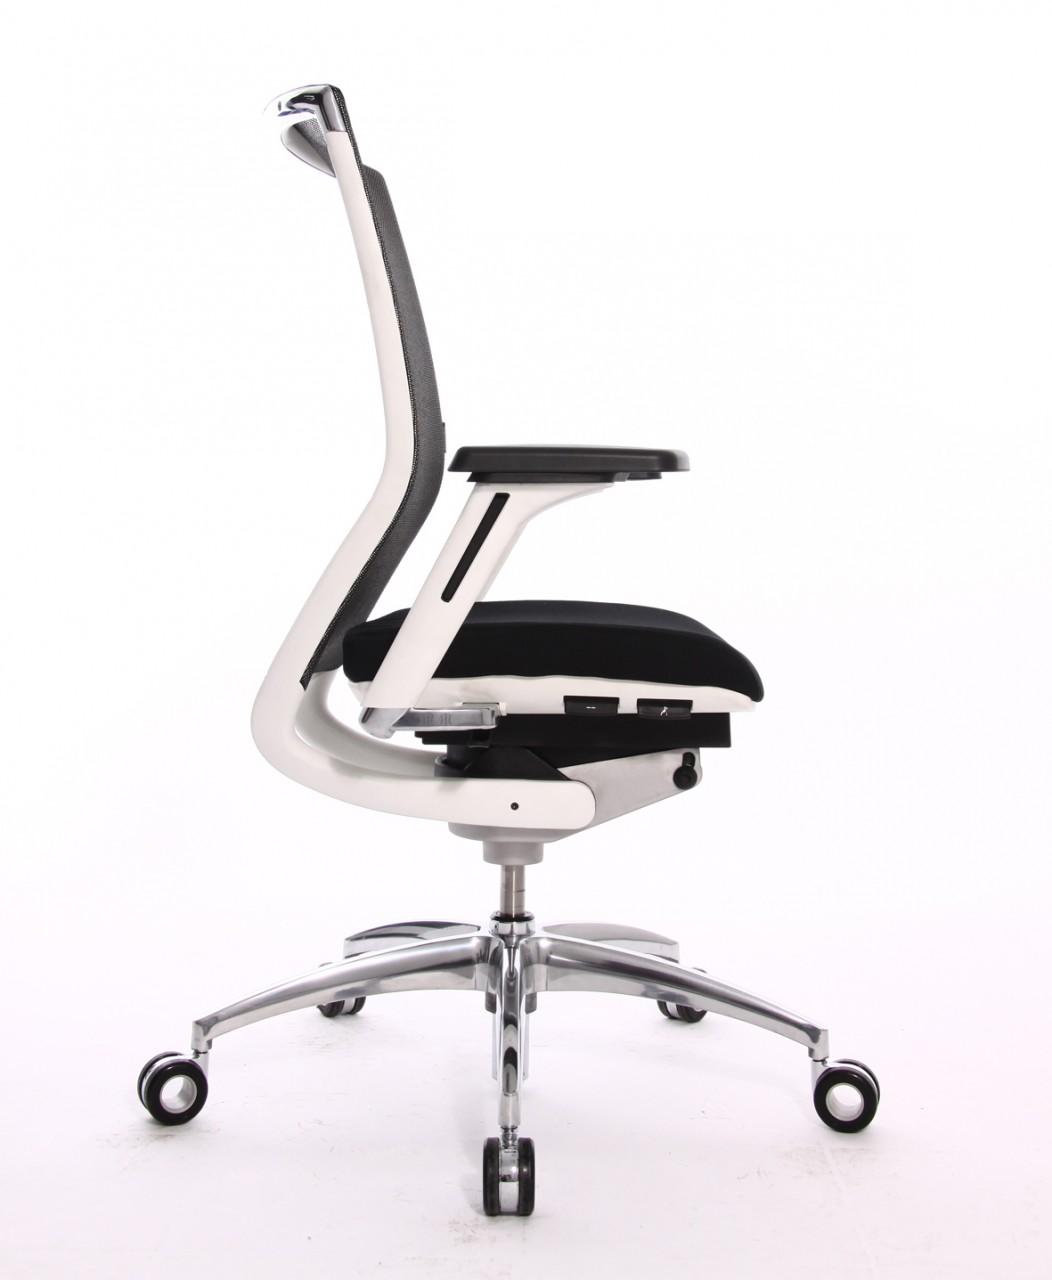 fauteuil de bureau haut de gamme titan 10 achat si ges de bureau 859 00. Black Bedroom Furniture Sets. Home Design Ideas